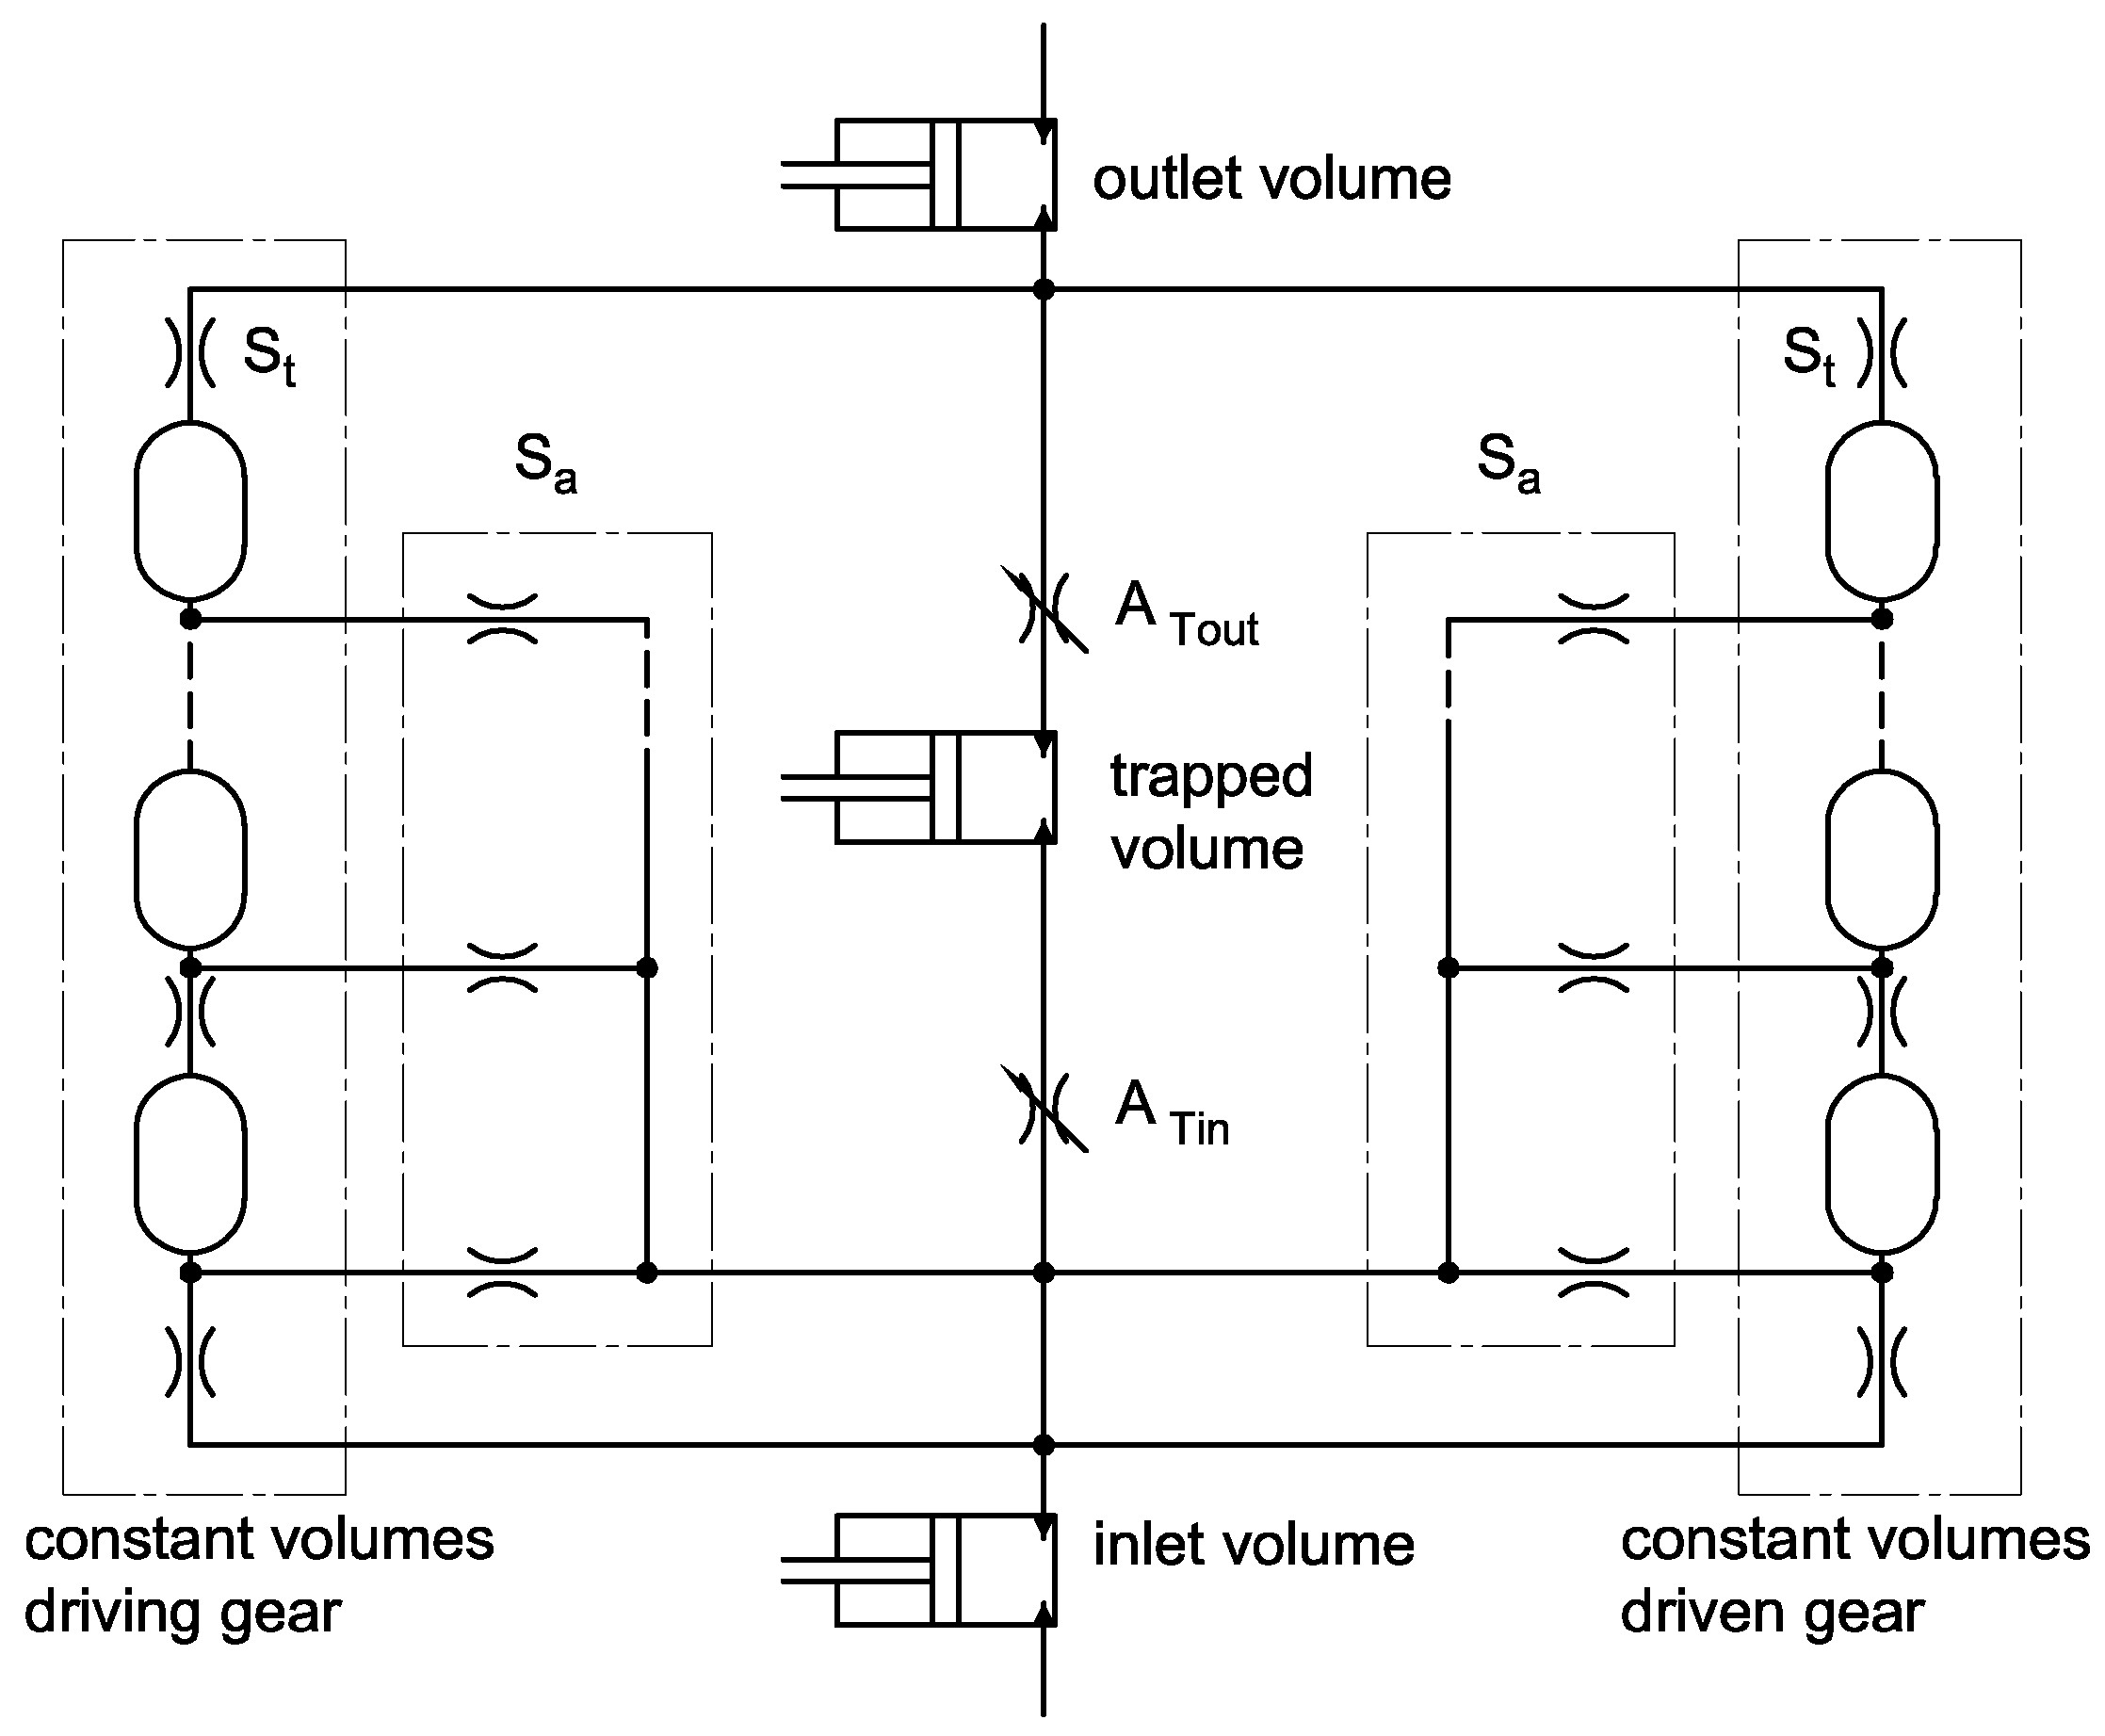 Diagram Of Car Gears Energies Free Full Text Of Diagram Of Car Gears Car Engine Belt Diagram 50 Unique Stock 2007 Bmw X3 Serpentine Belt